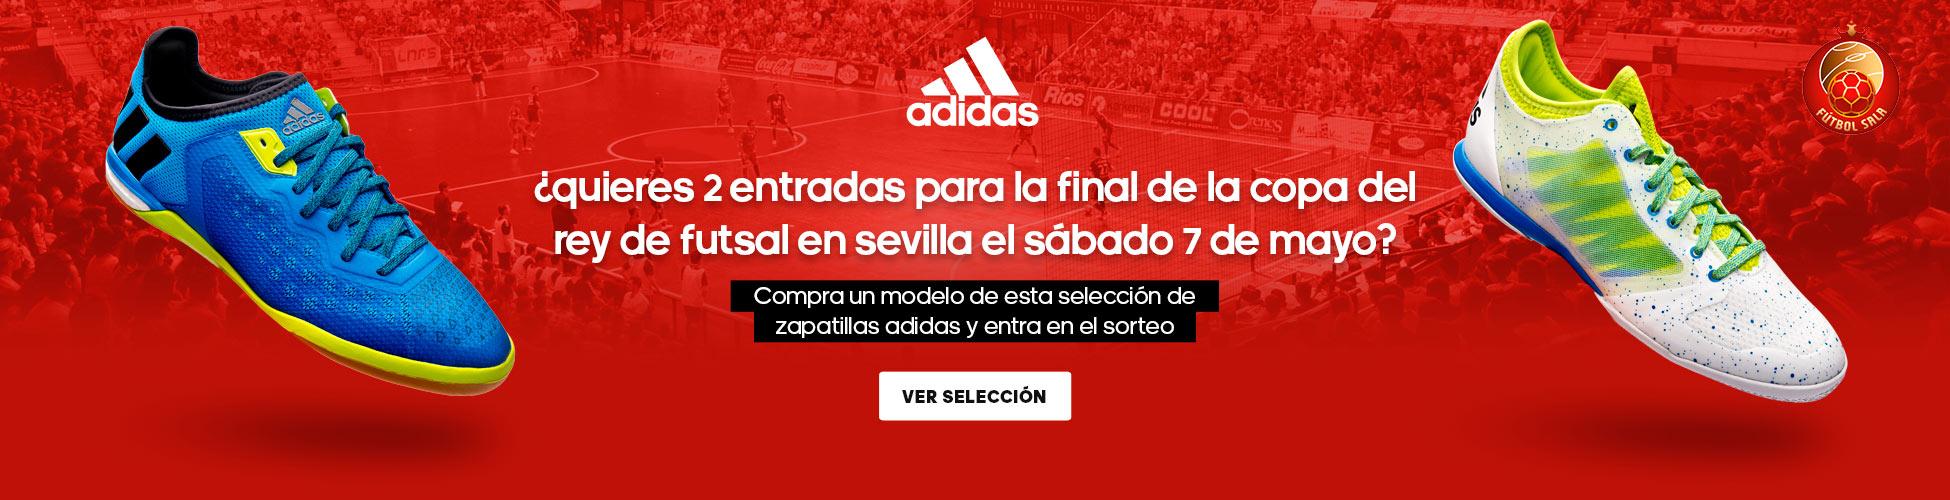 Promo Copa del Rey FutSal